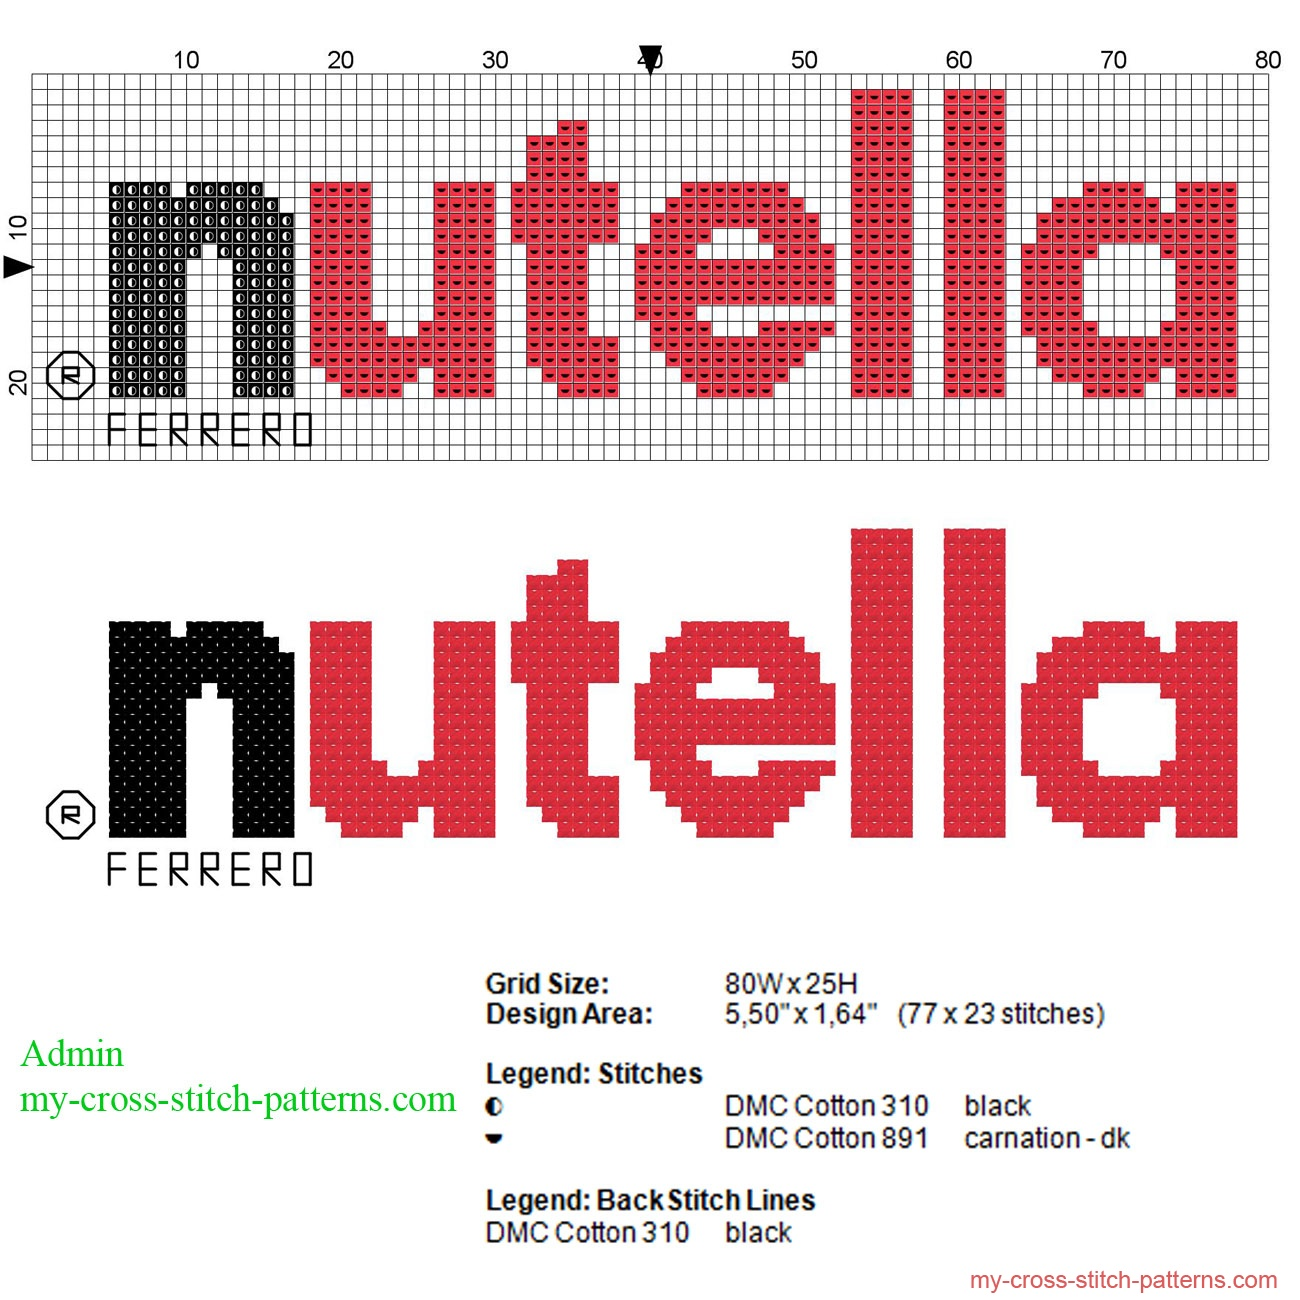 nutella_logo_cross_stitch_pattern_77_x_23_stitches_2_dmc_threads